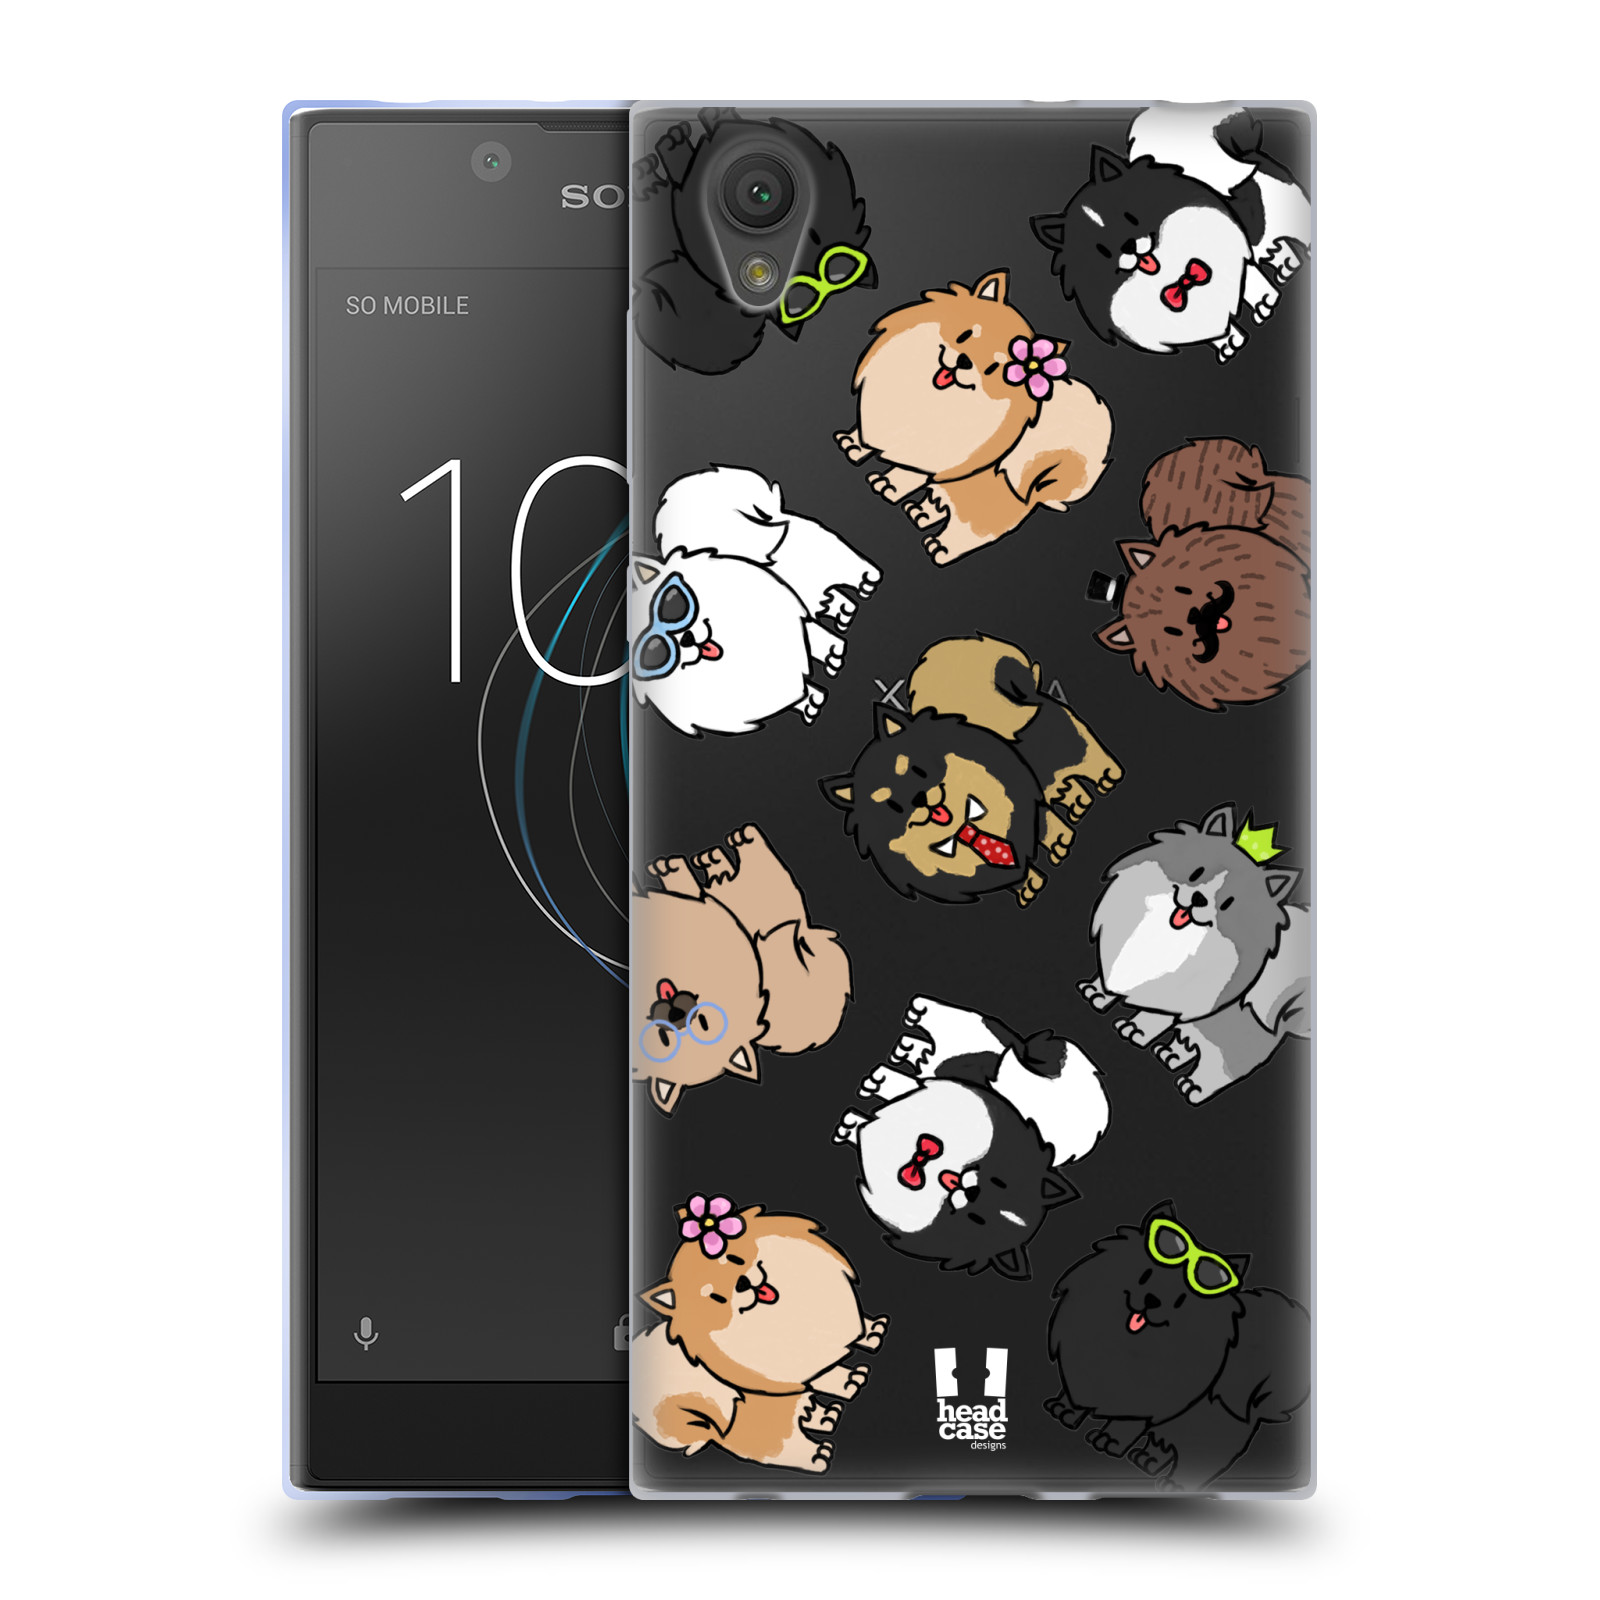 HEAD CASE silikonový obal na mobil Sony Xperia L1 pejsek Pomeranian